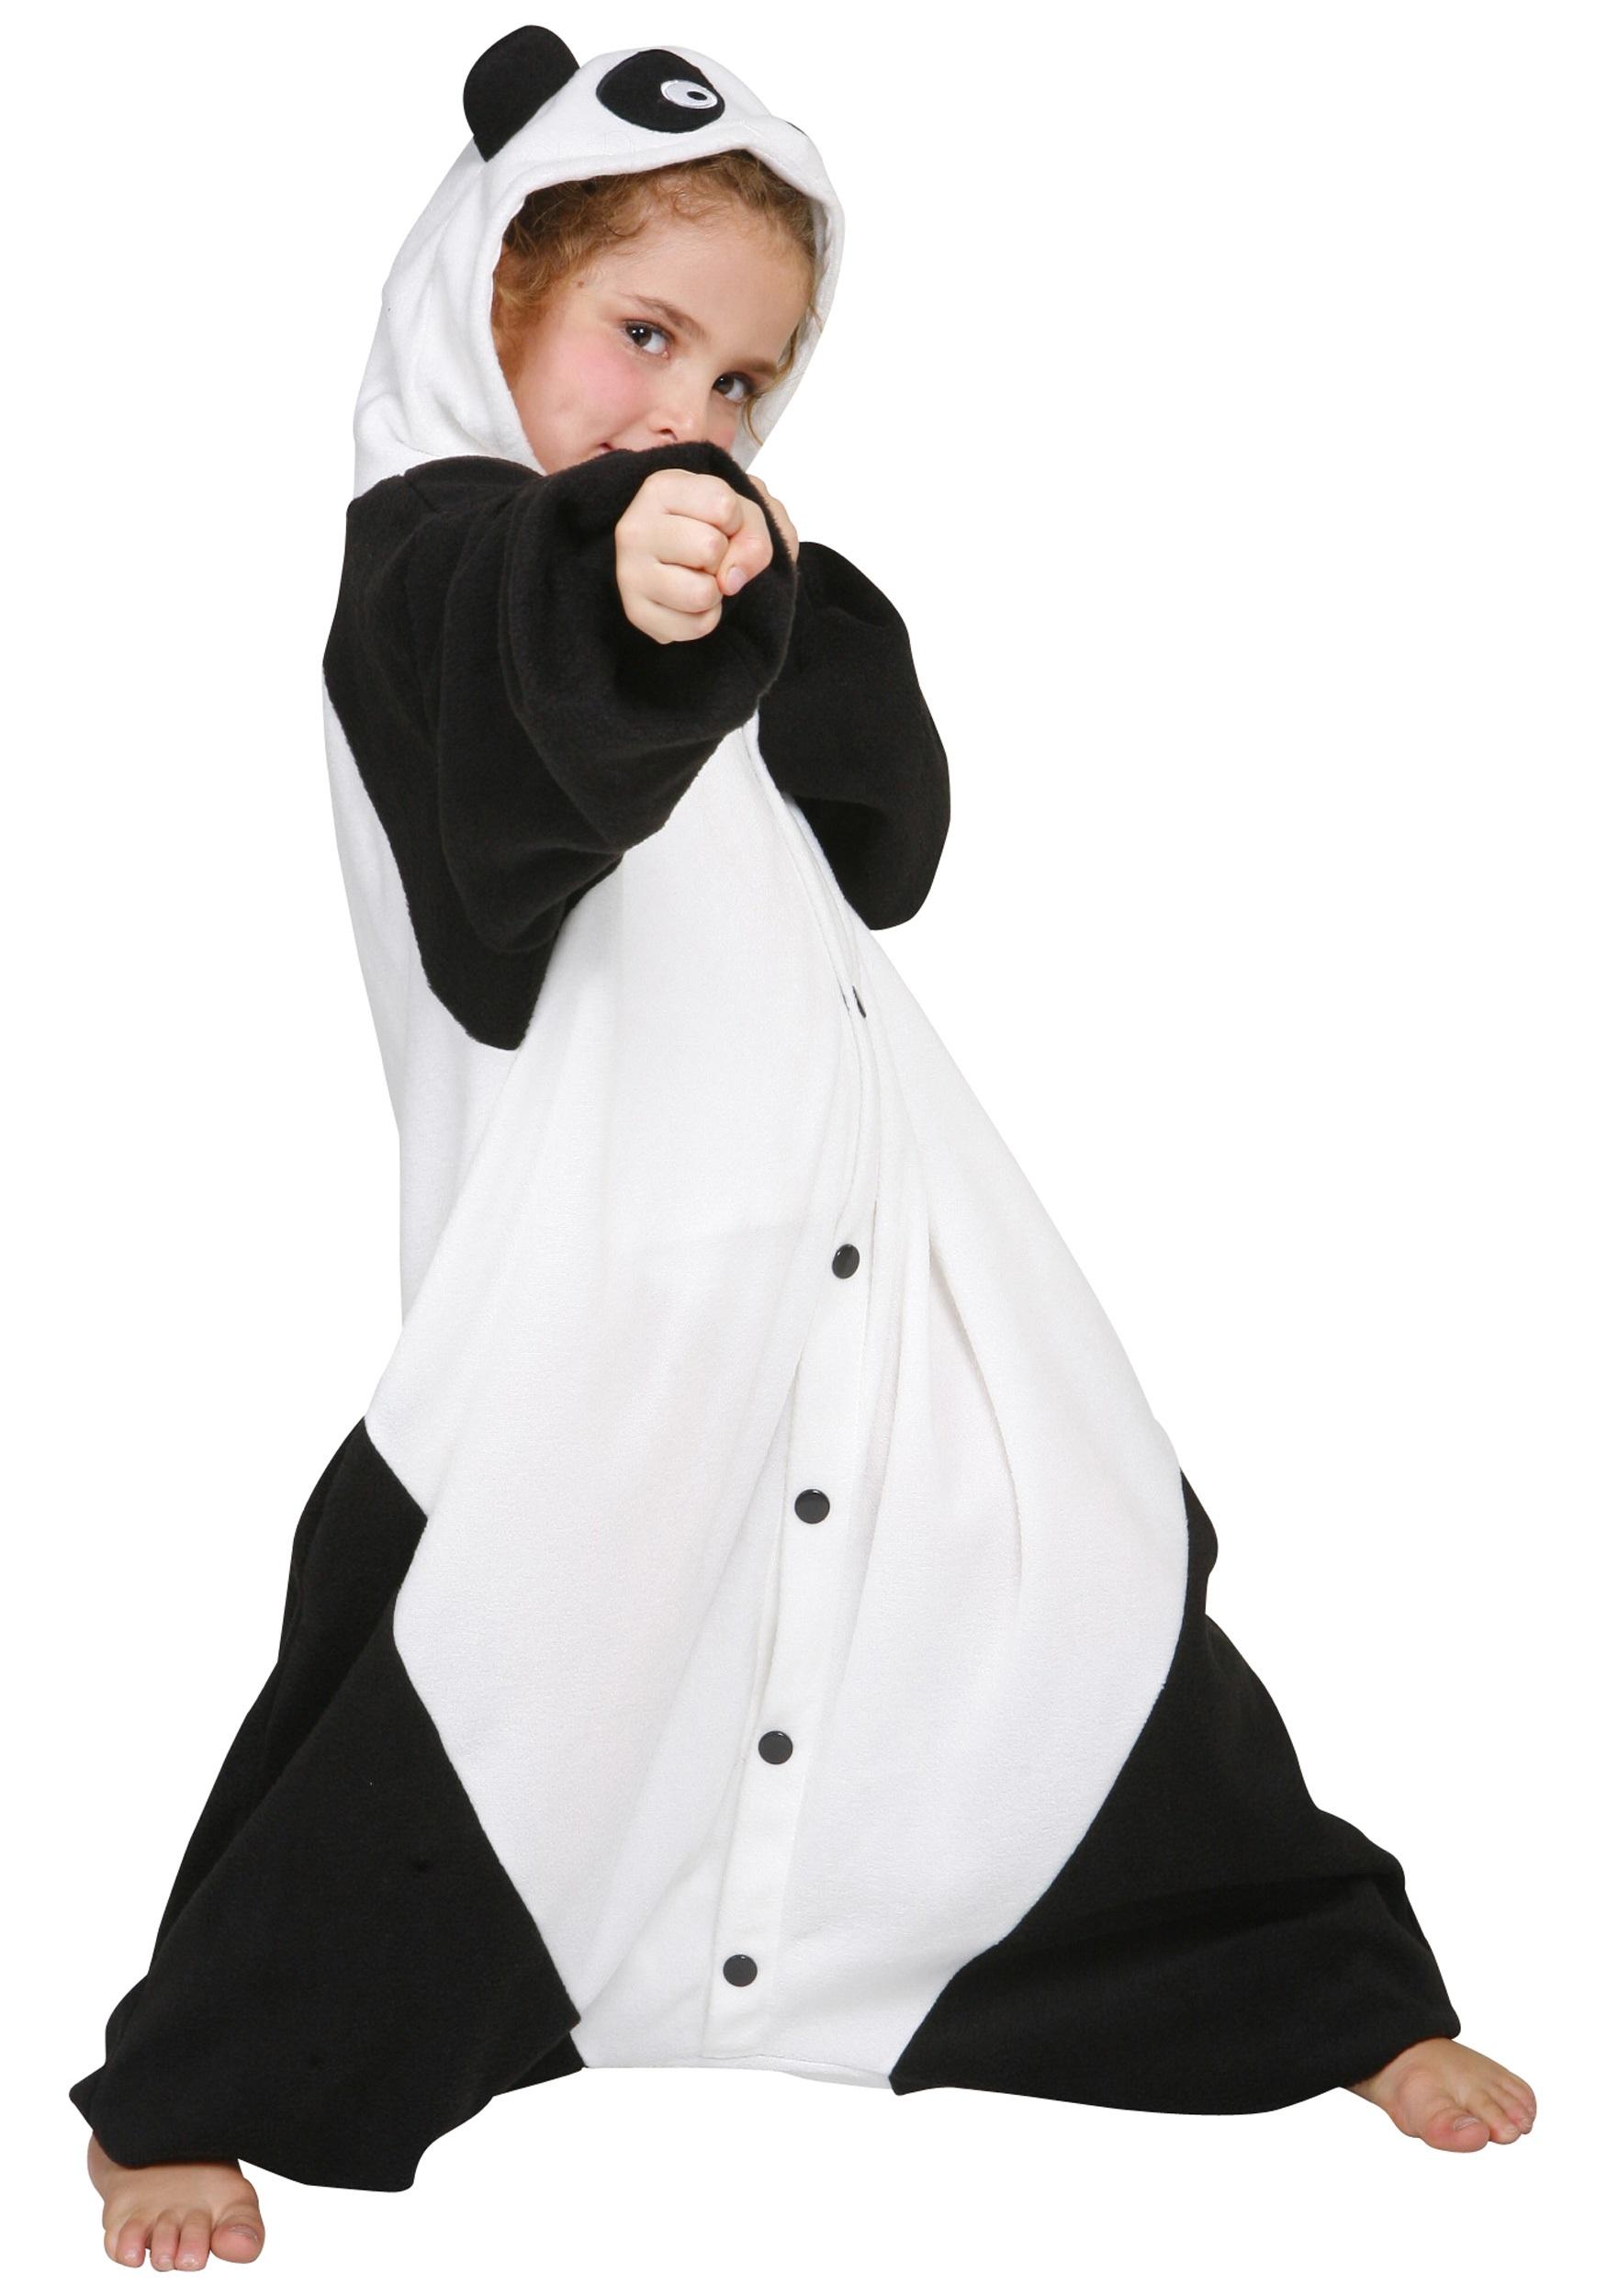 Kids Panda Pajama Costume  sc 1 st  Halloween Costumes & Kids Panda Pajama Costume - Halloween Costumes